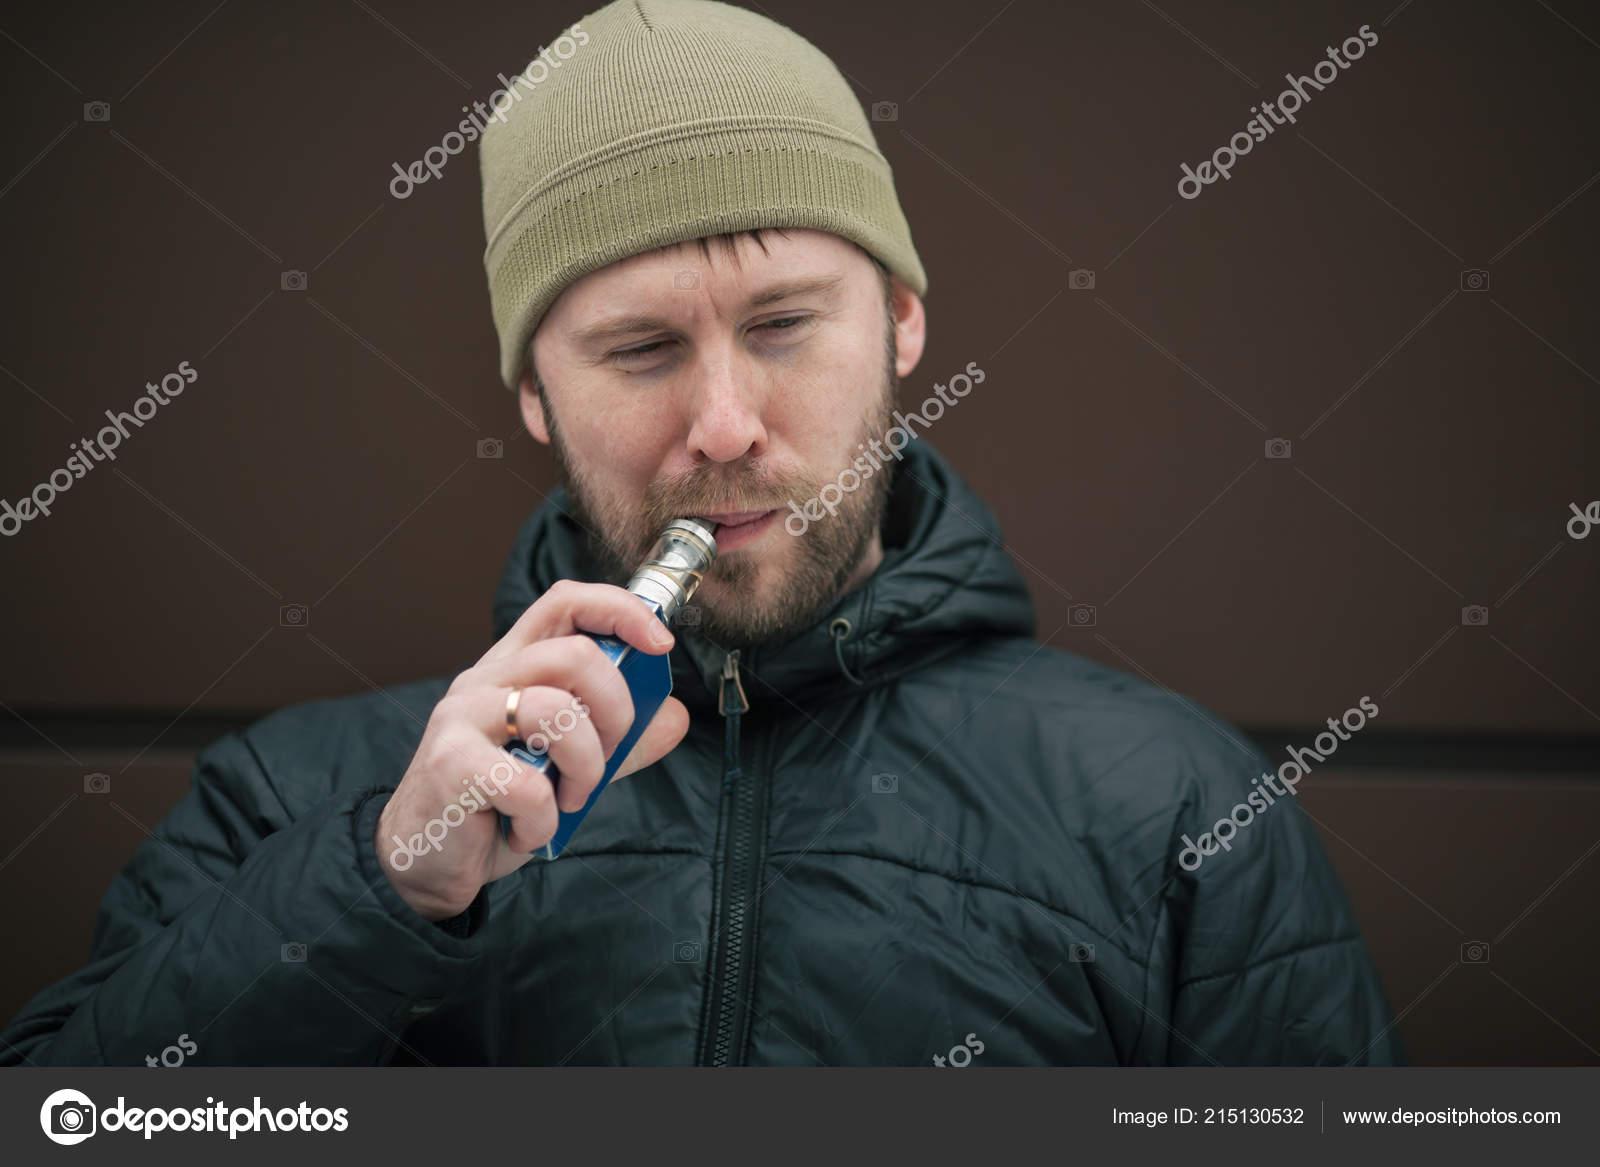 2d8efaa72bb Vape Man Young Bearded White Guy Cap Black Jacket Smoking — Stock Photo